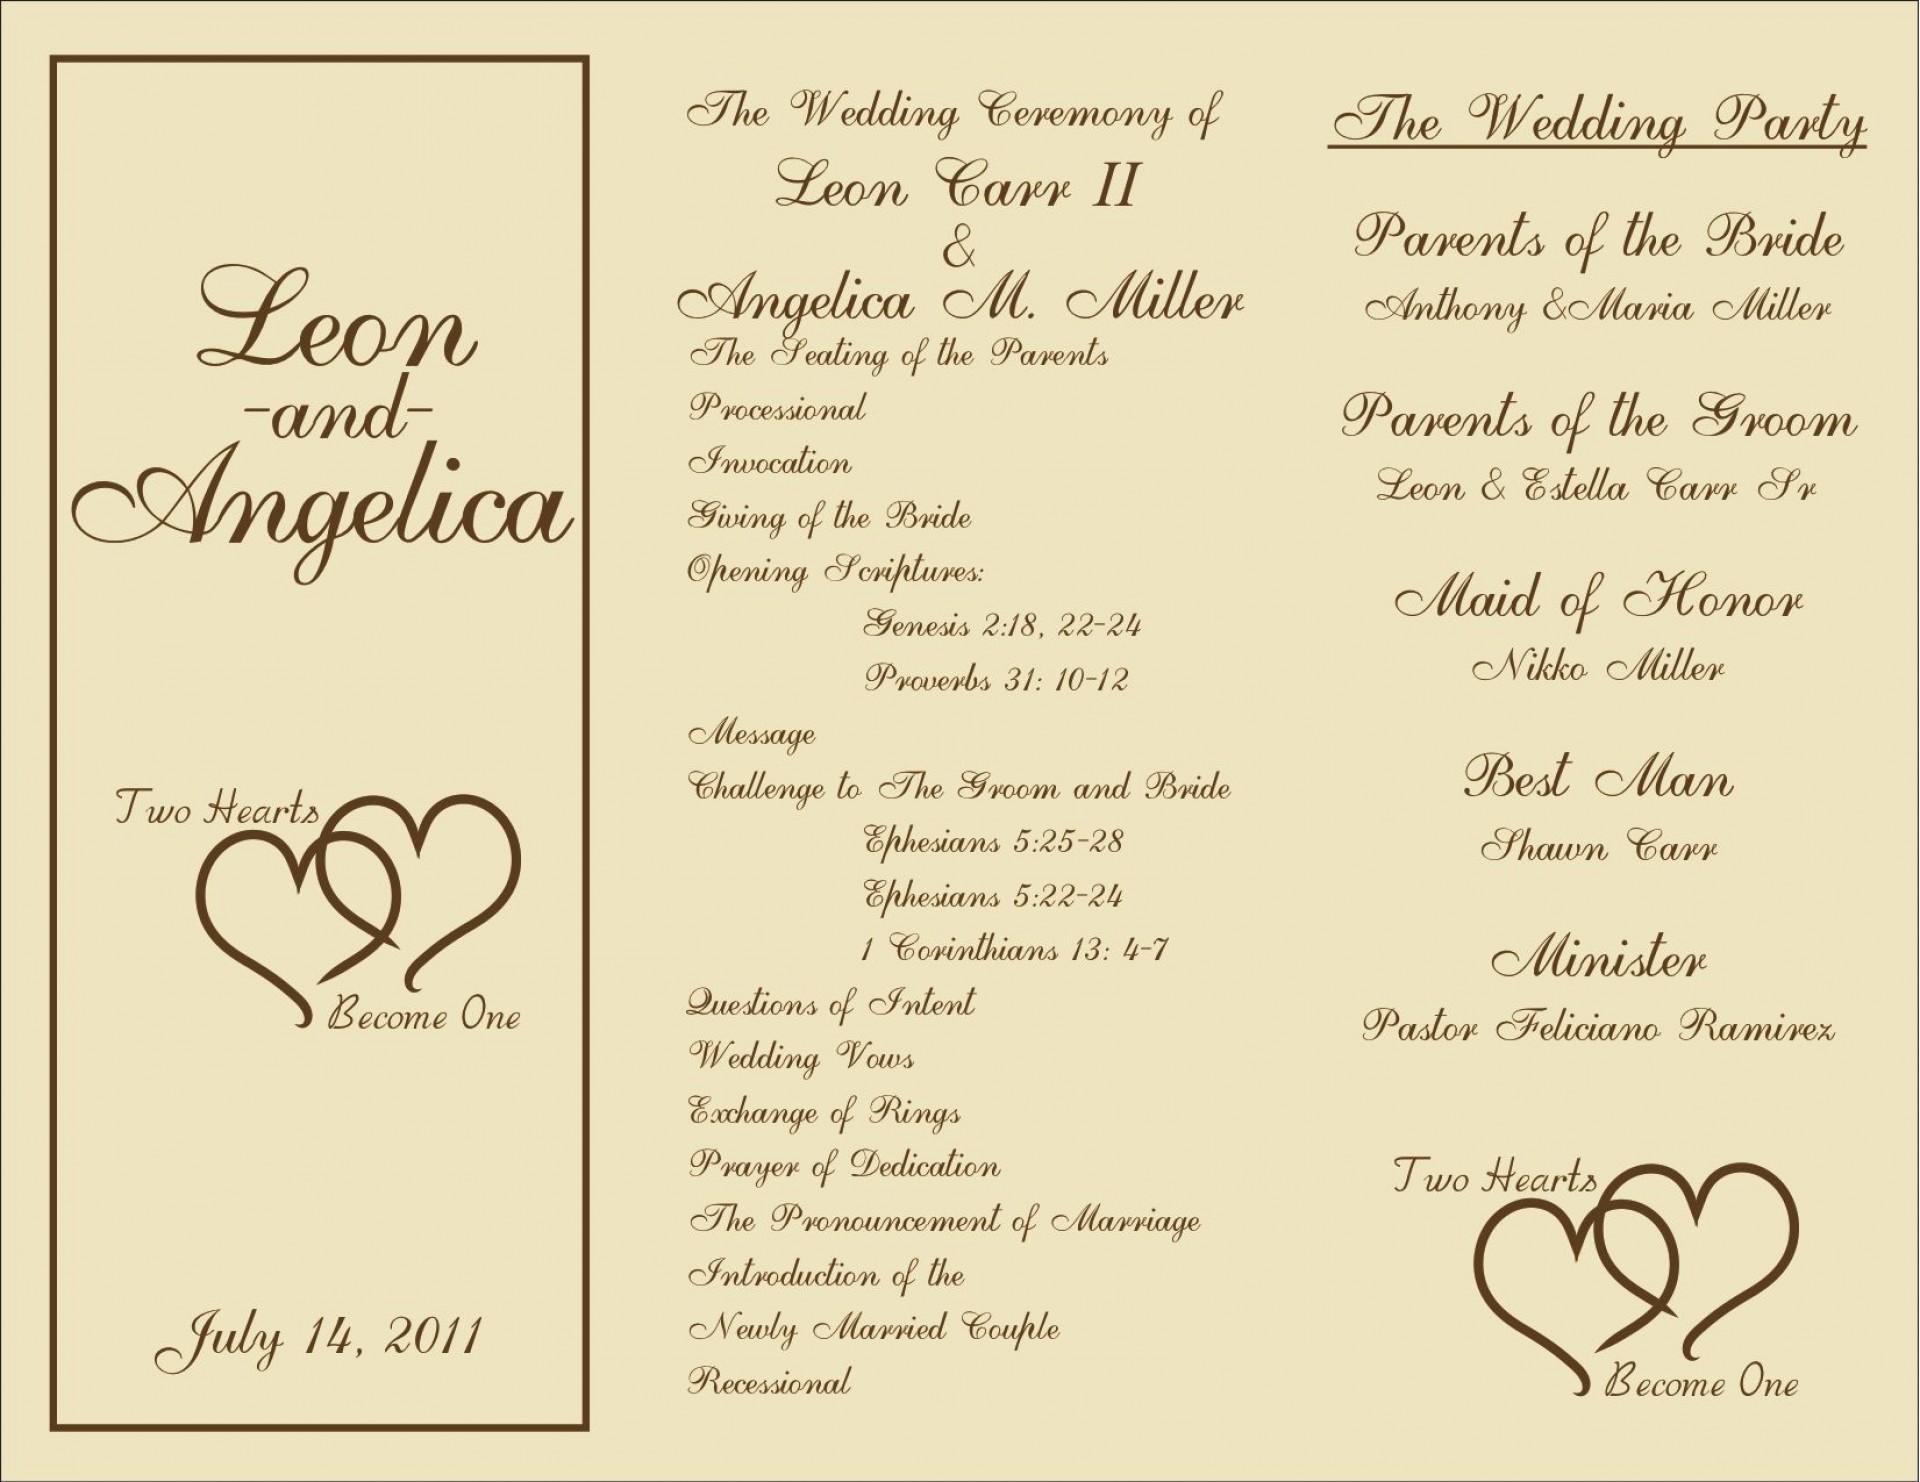 004 Unbelievable Free Download Template For Wedding Program Image  Programs1920